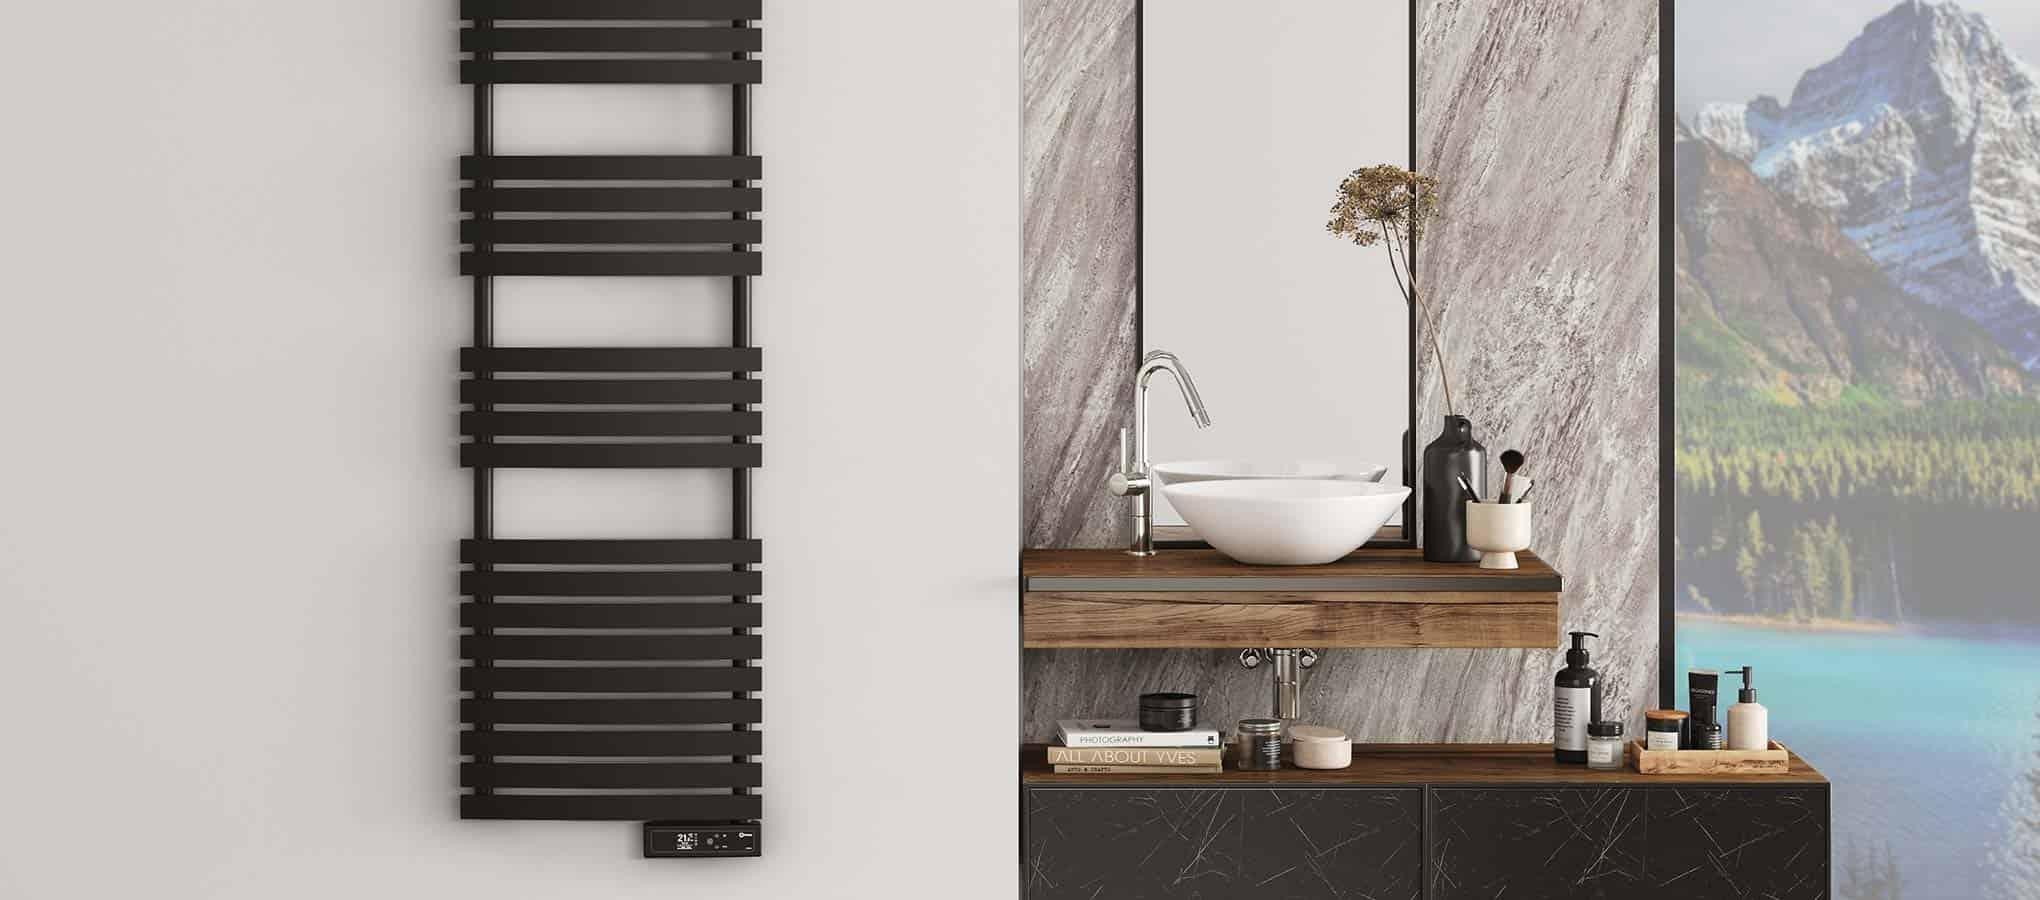 Rointe electric towel rail steel oil filled smart enabled wifi black